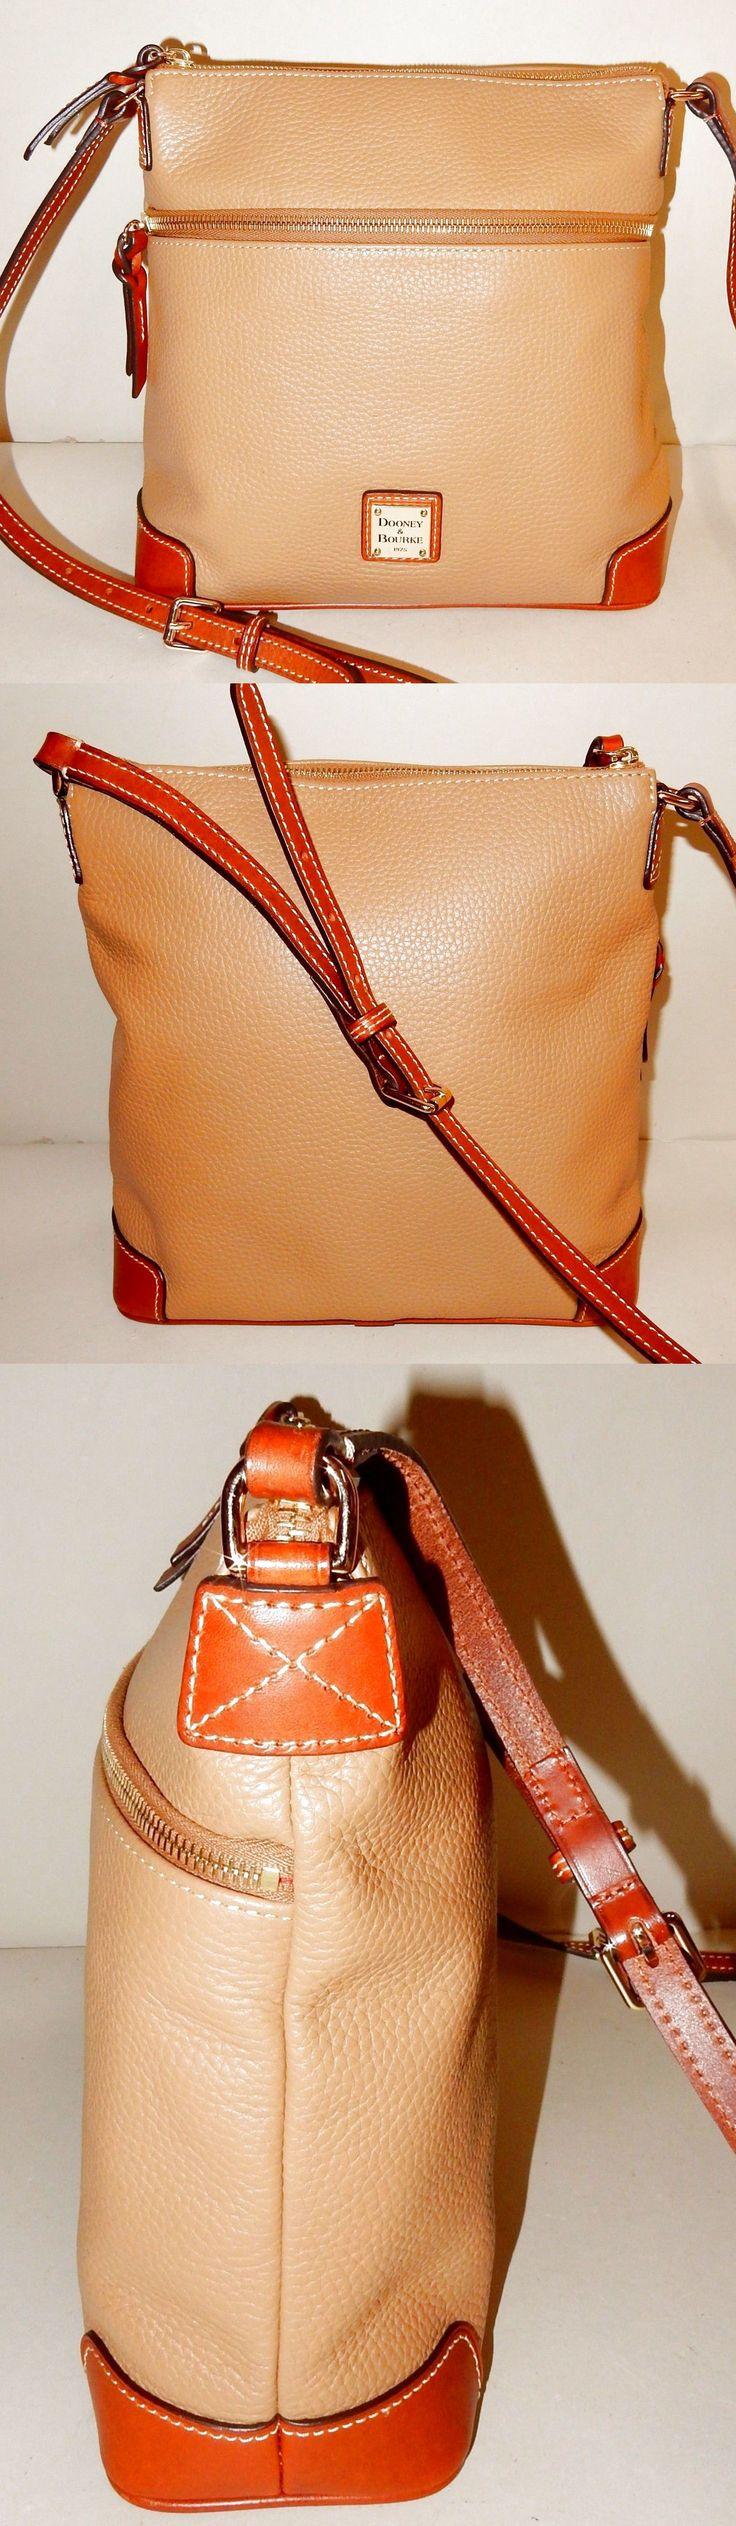 Dooney & Bourke Pebble Leather Crossbody Bag in Desert $69.99